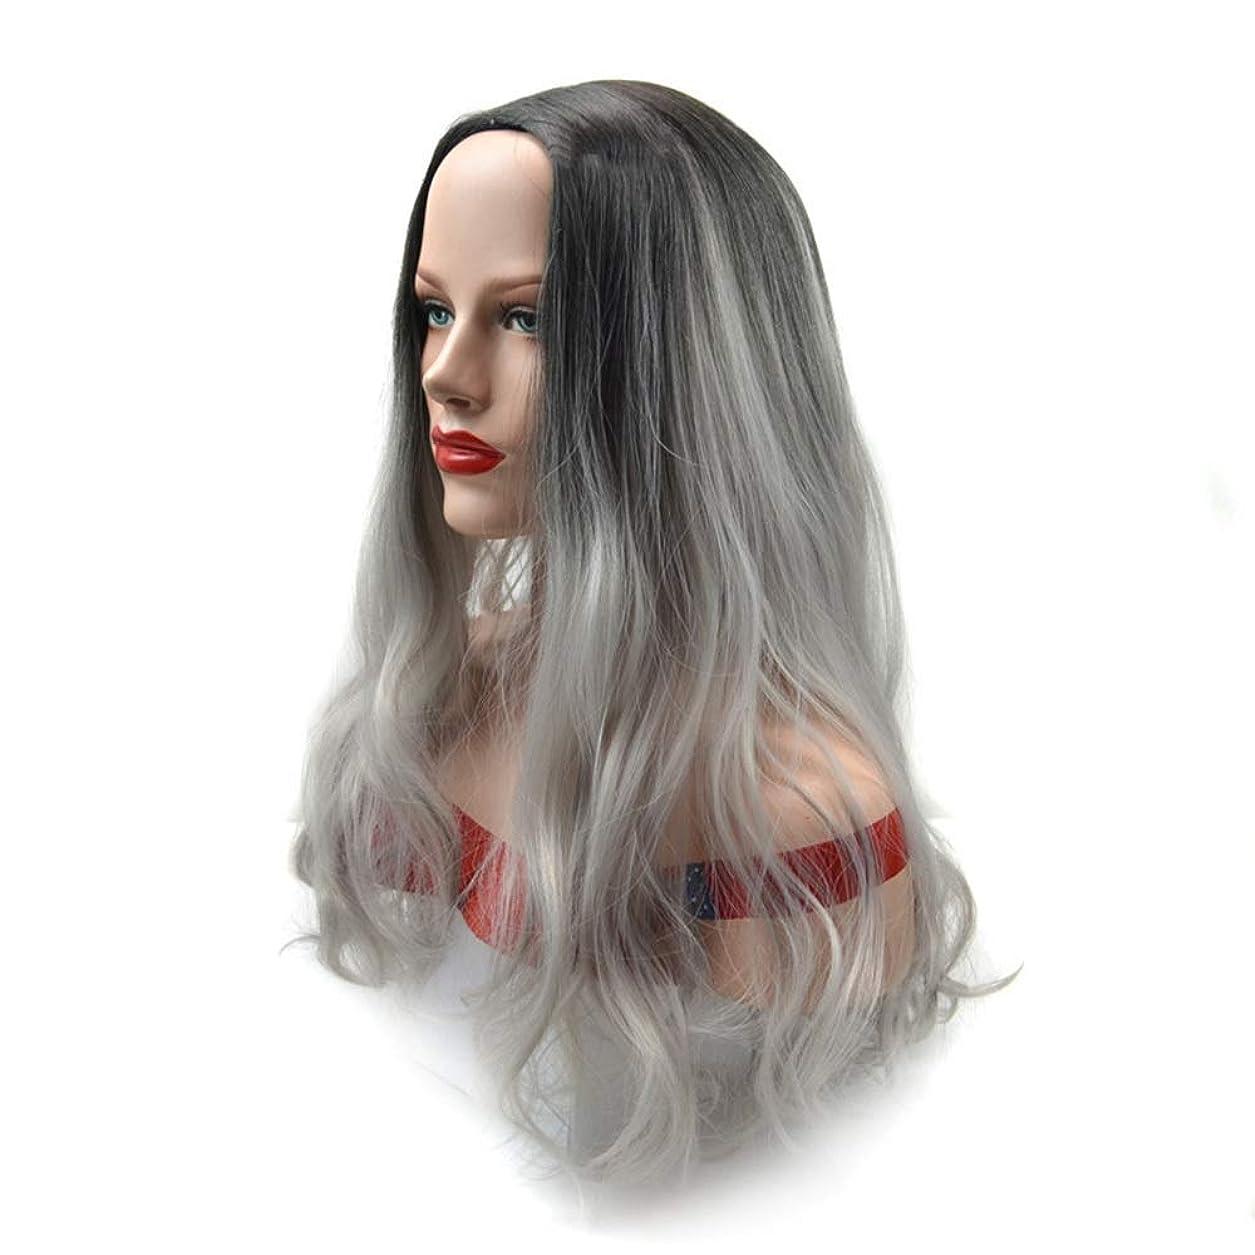 HOHYLLYA 自然なおばあちゃんの灰のかつら黒の女性のパーティーのかつらのための長い巻き毛の合成かつら (色 : Grandma ash, サイズ : 60cm)